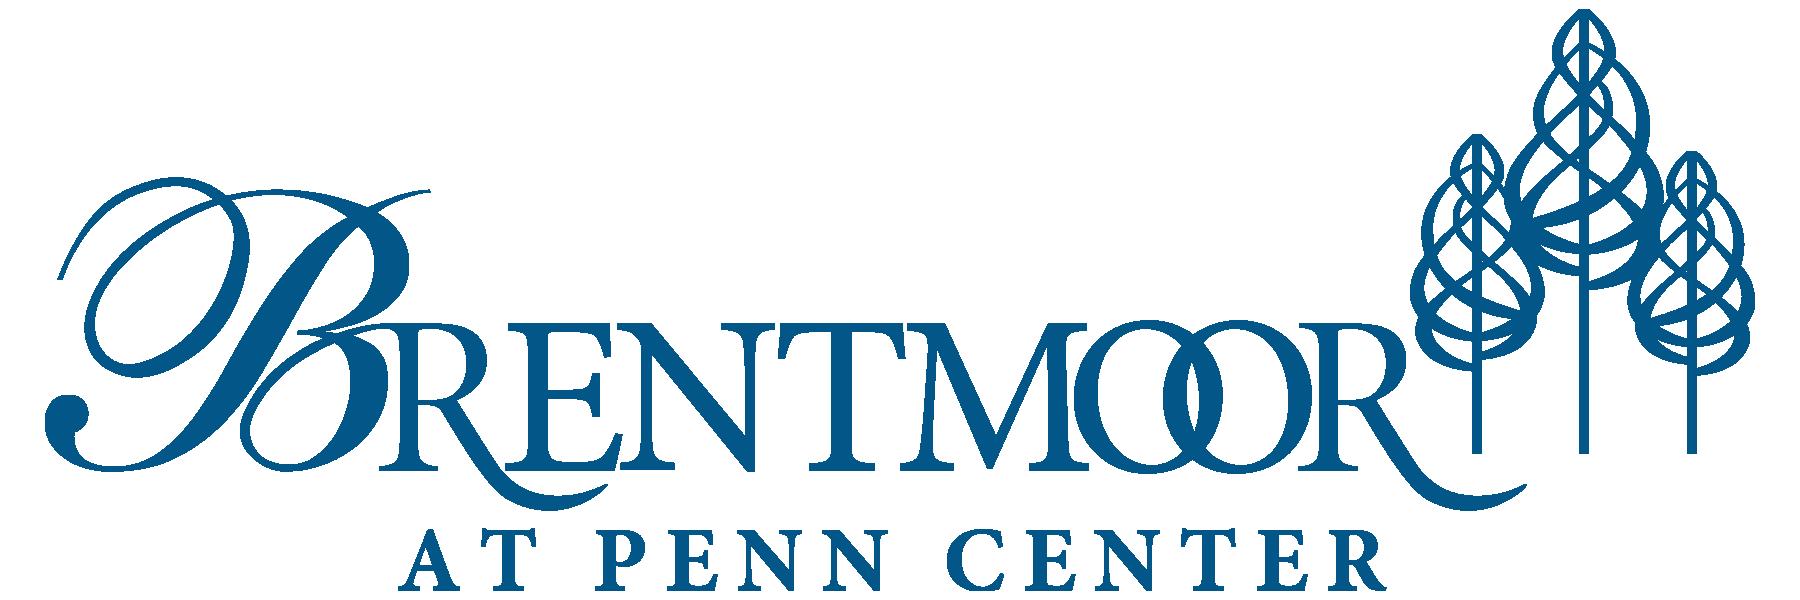 Brentmoor at Penn Center